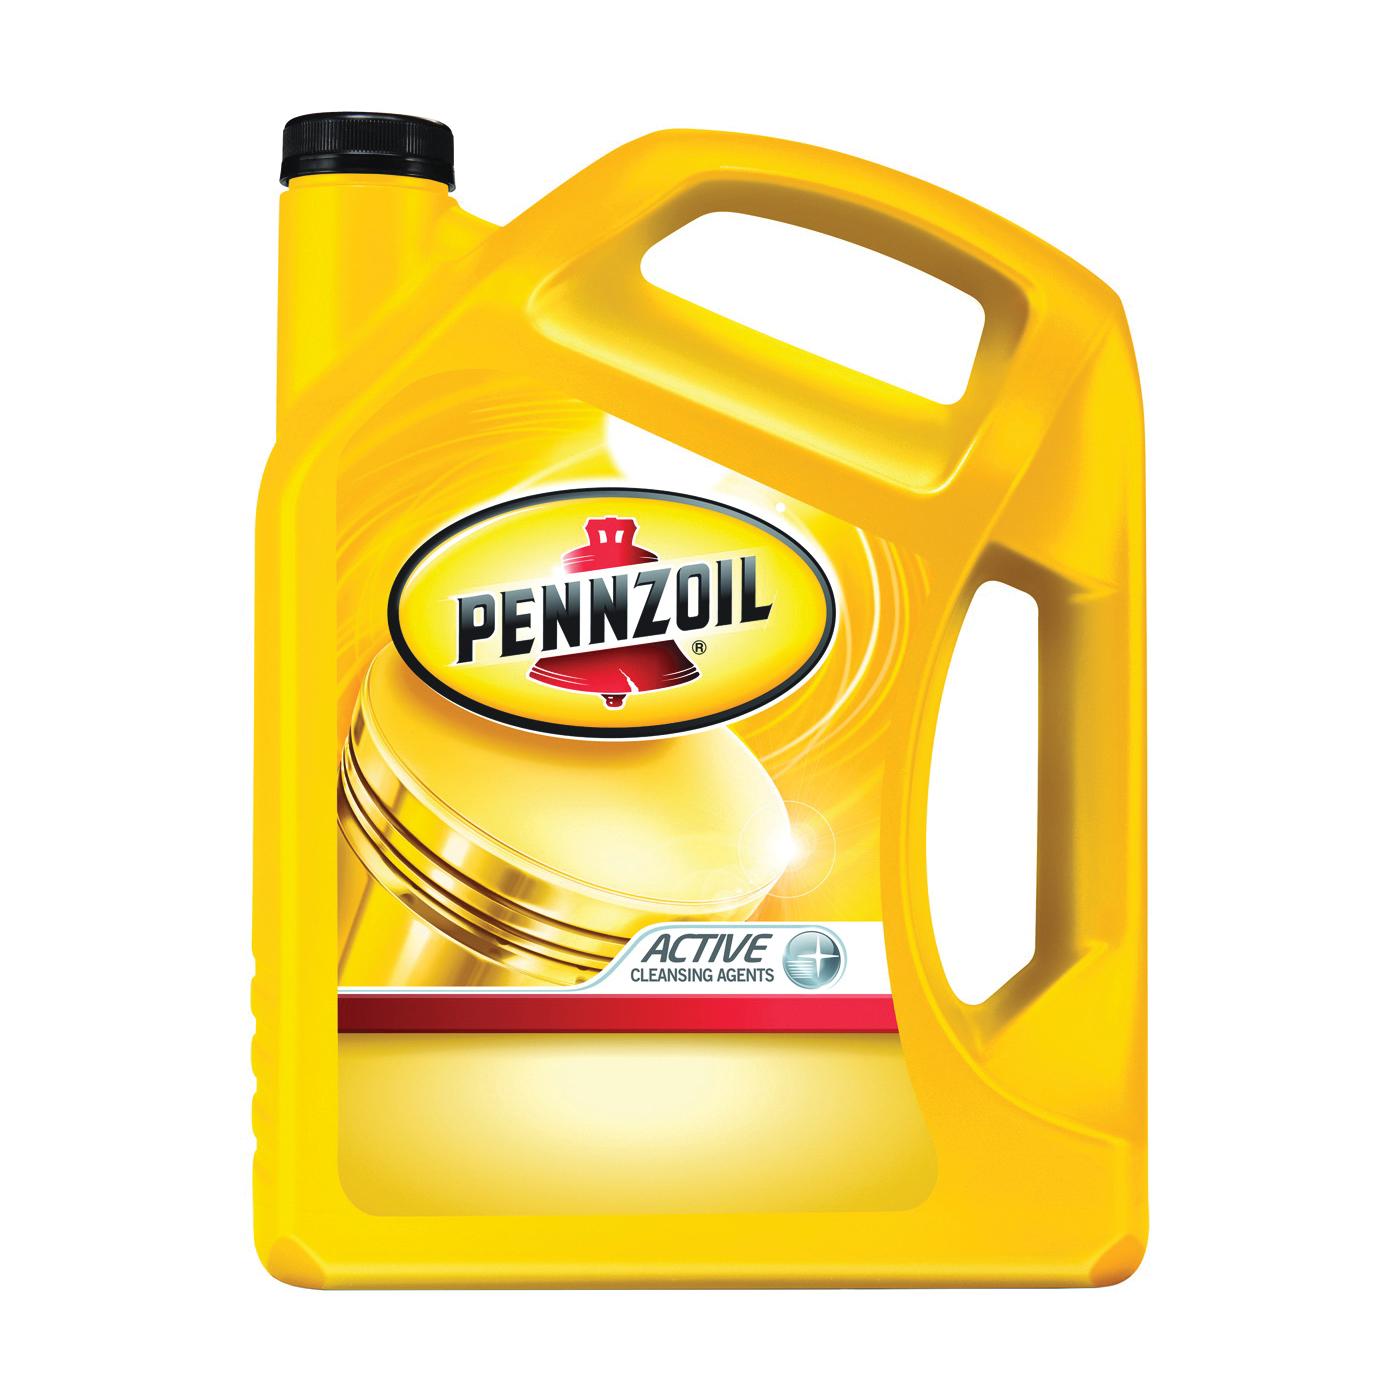 Picture of Pennzoil 550045208 Motor Oil, 5W-30, 5 qt Package, Bottle